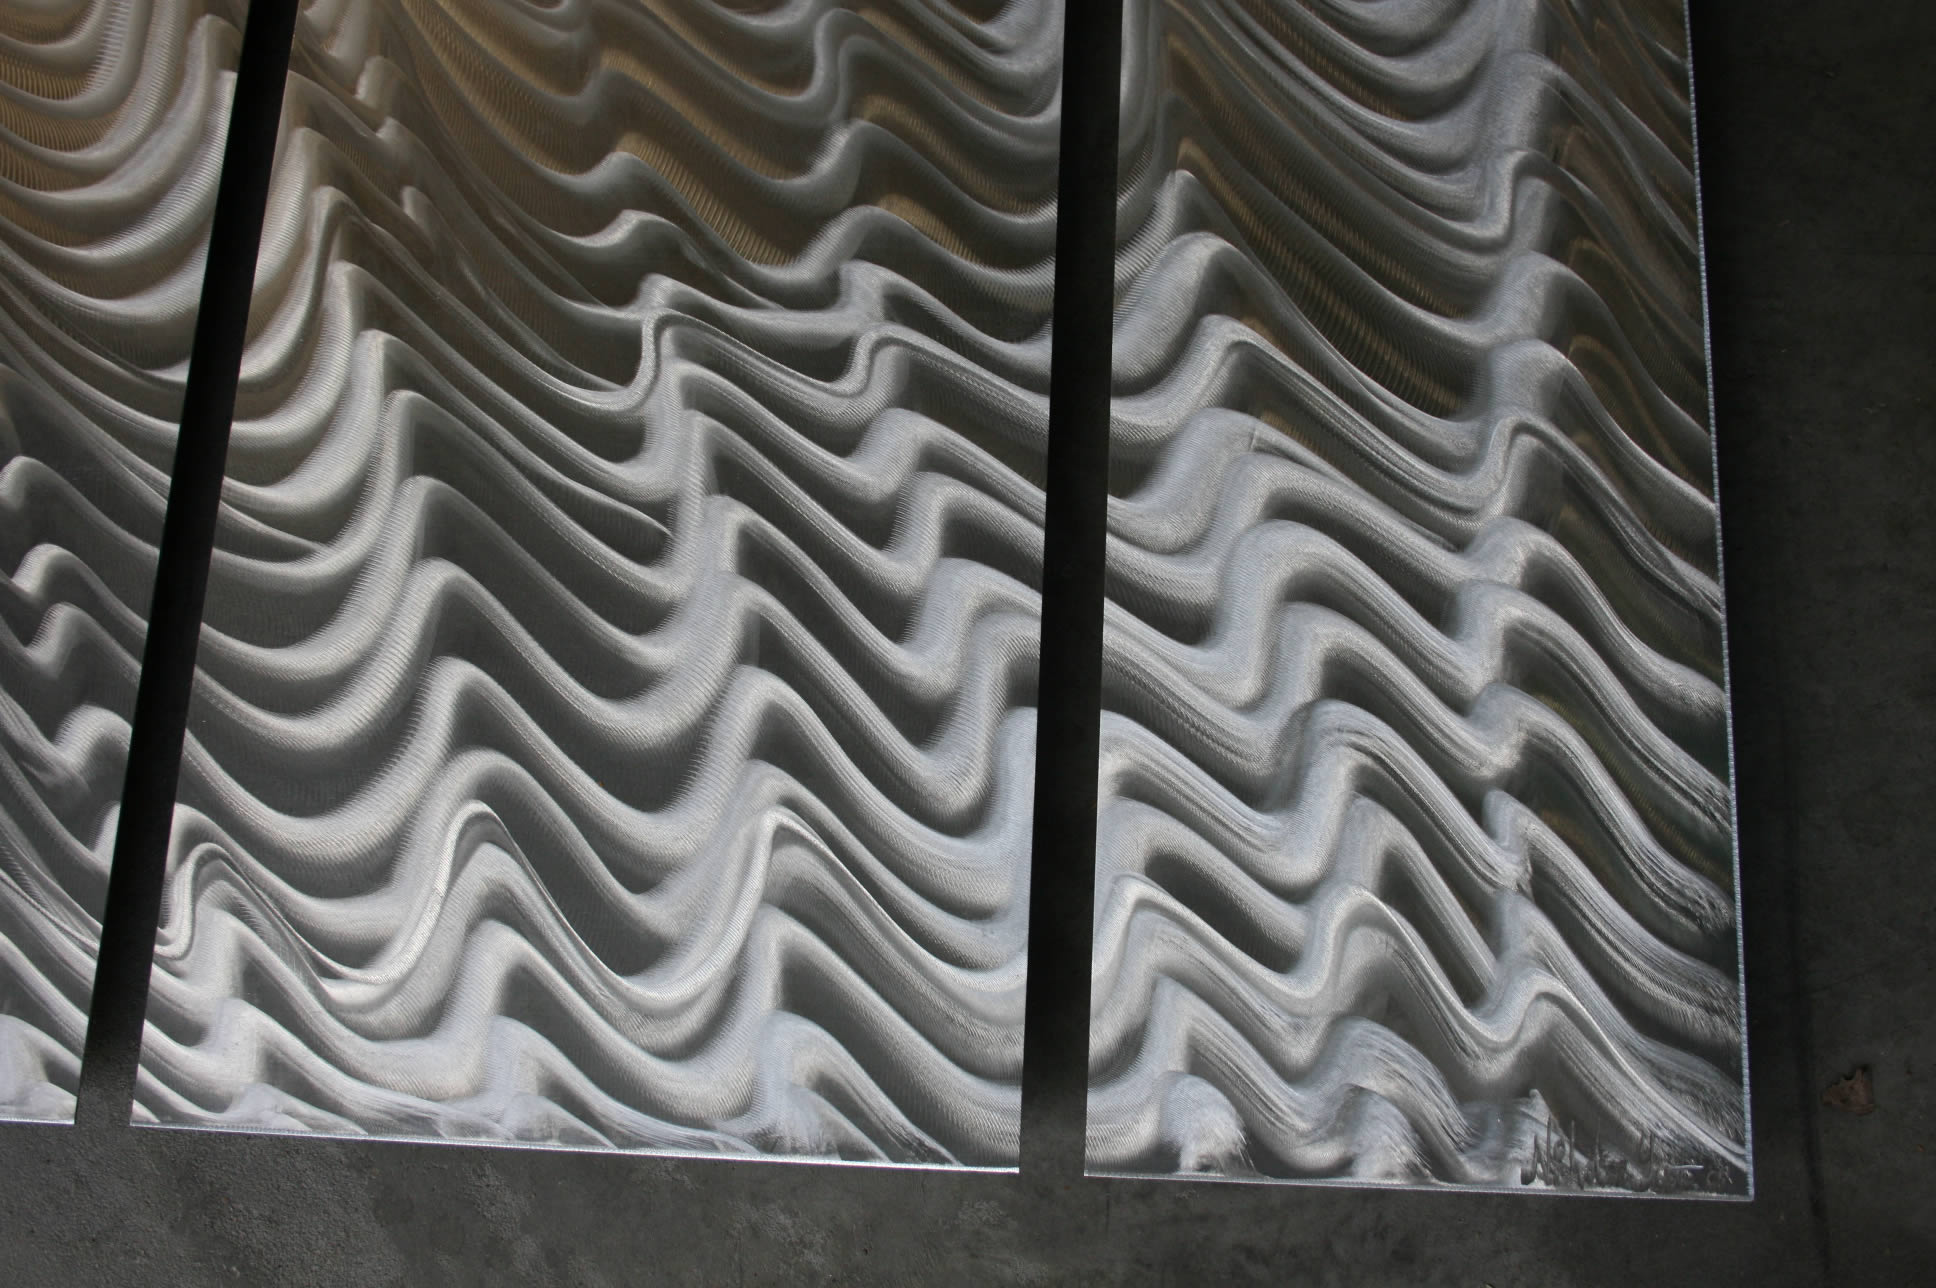 NYT0056M - Metal Art by Nicholas Yust, Alternate Angle 4